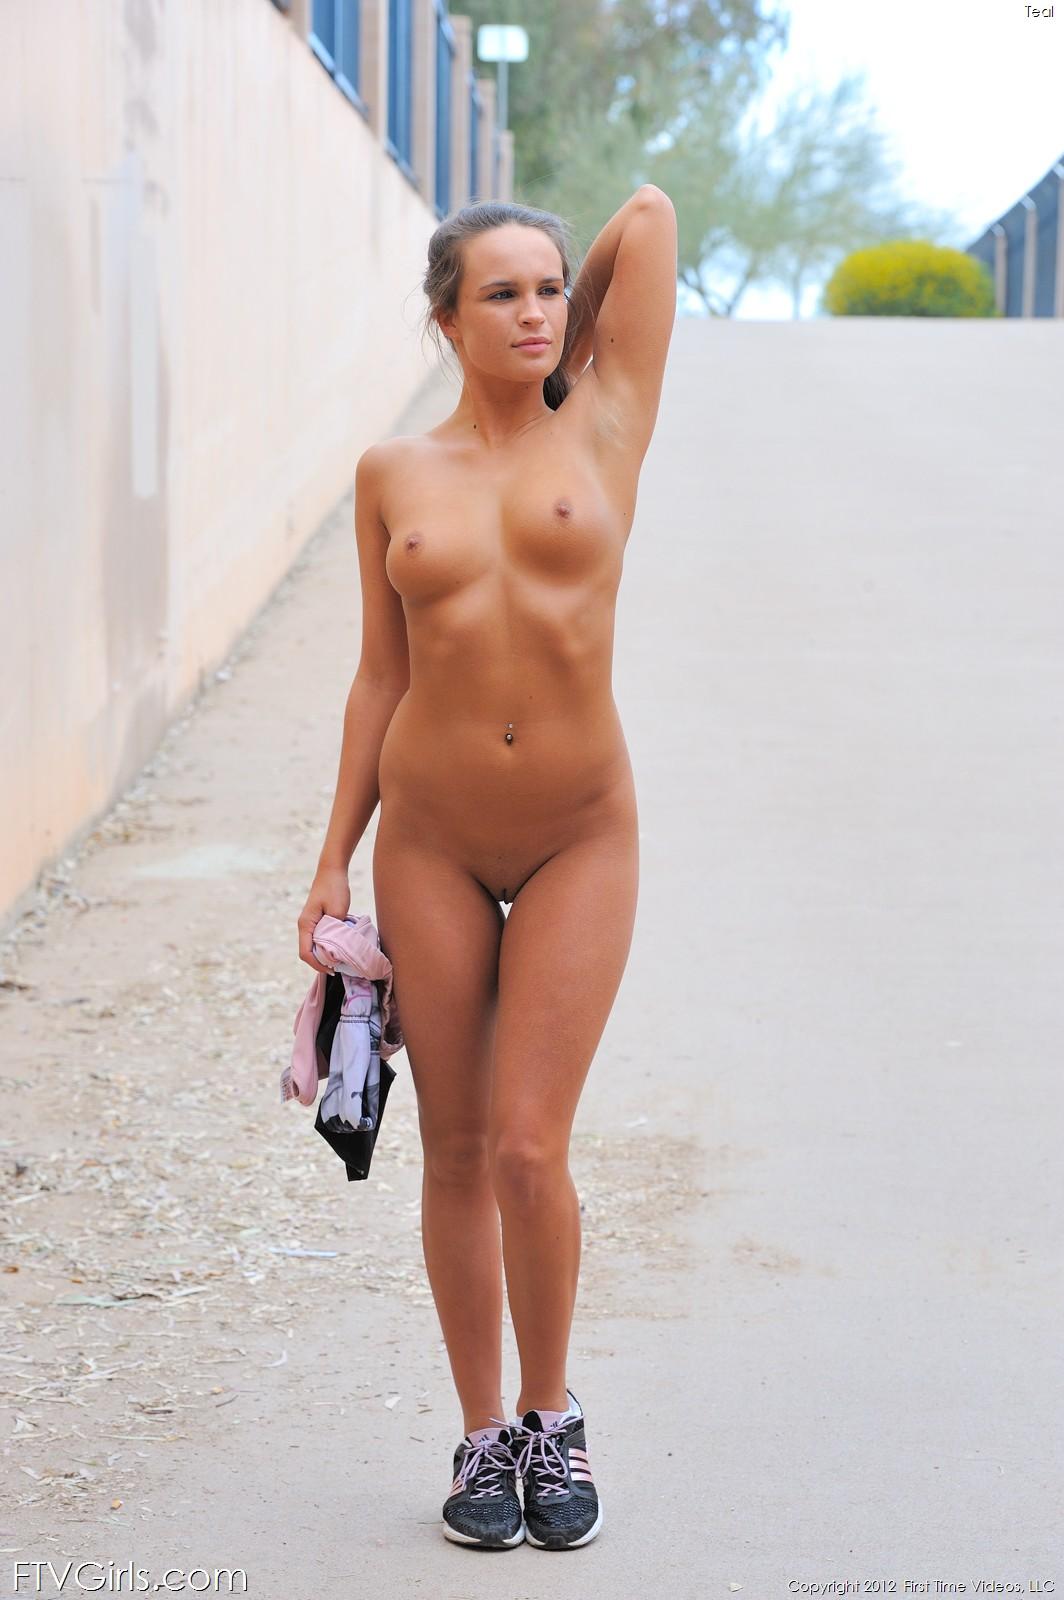 Naked Self Taken Pic Pussy